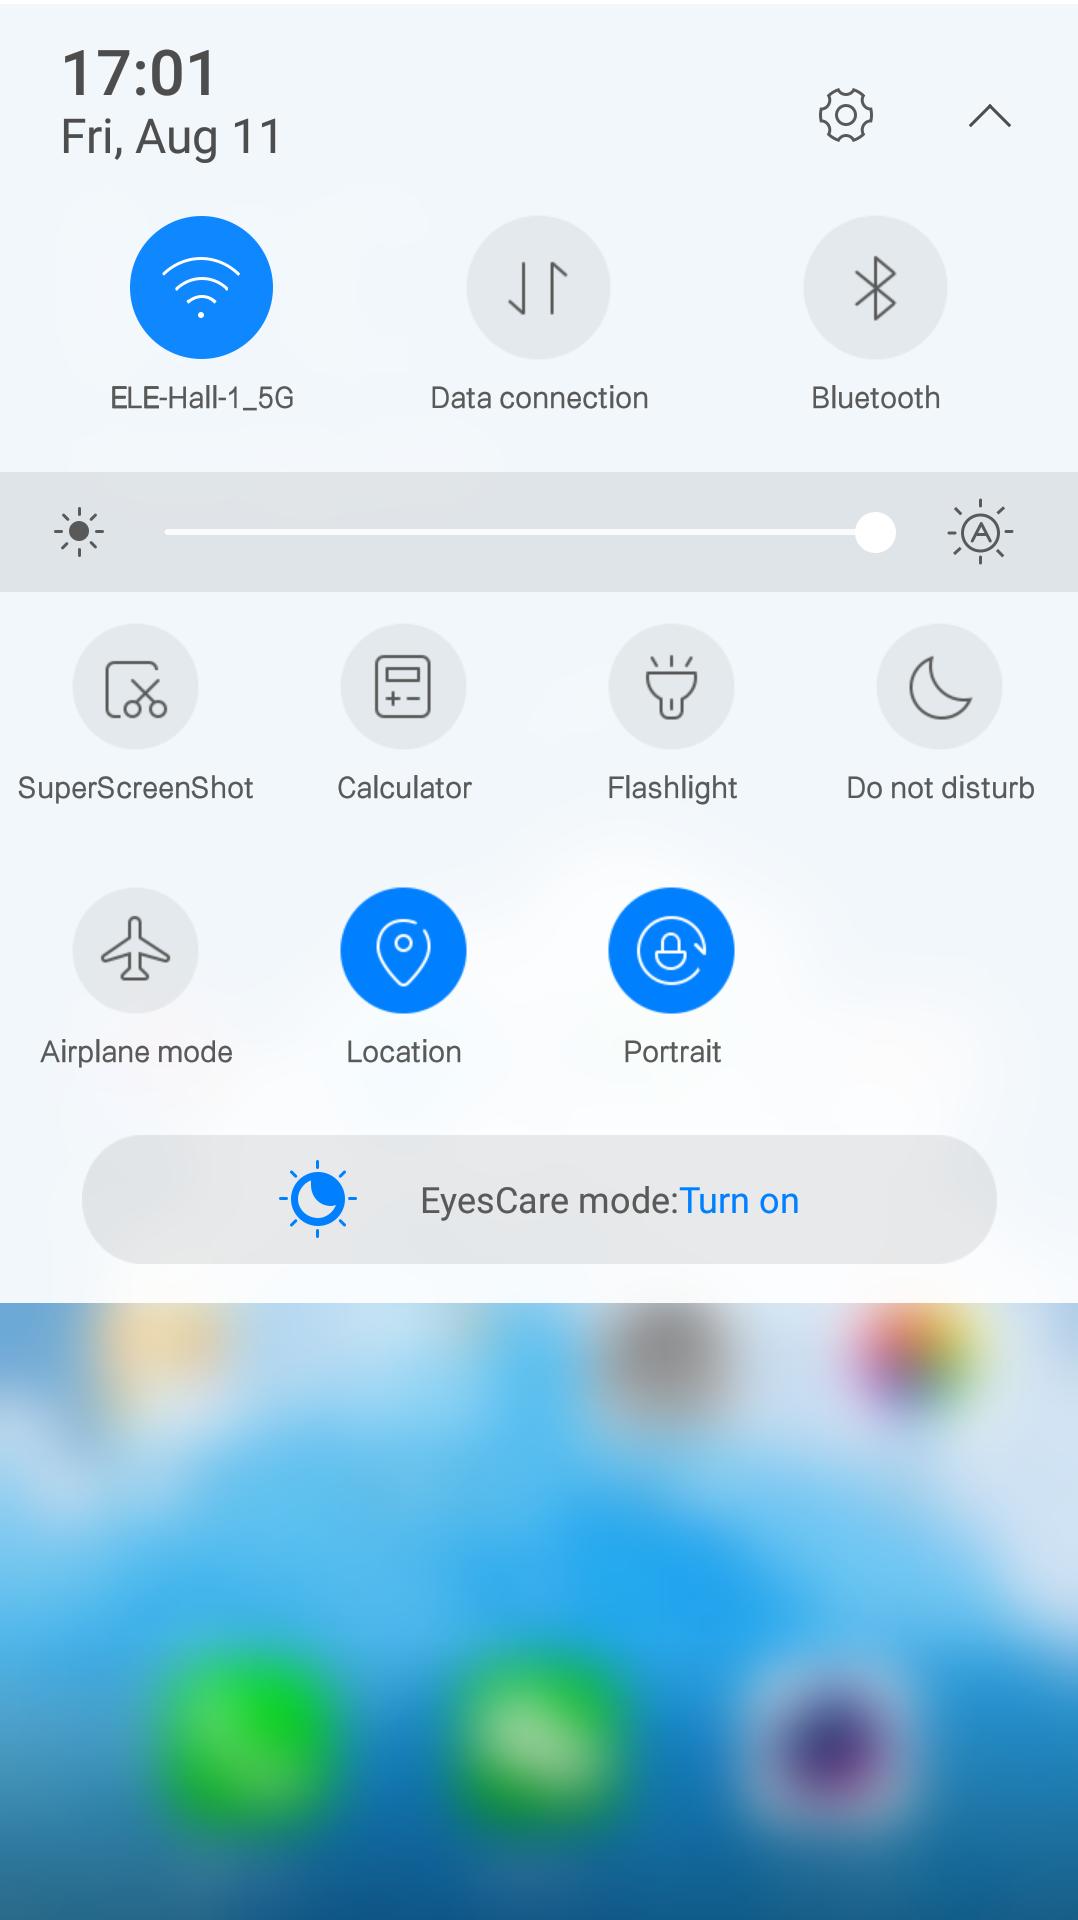 ELE OS 1.0 Eyecare mode